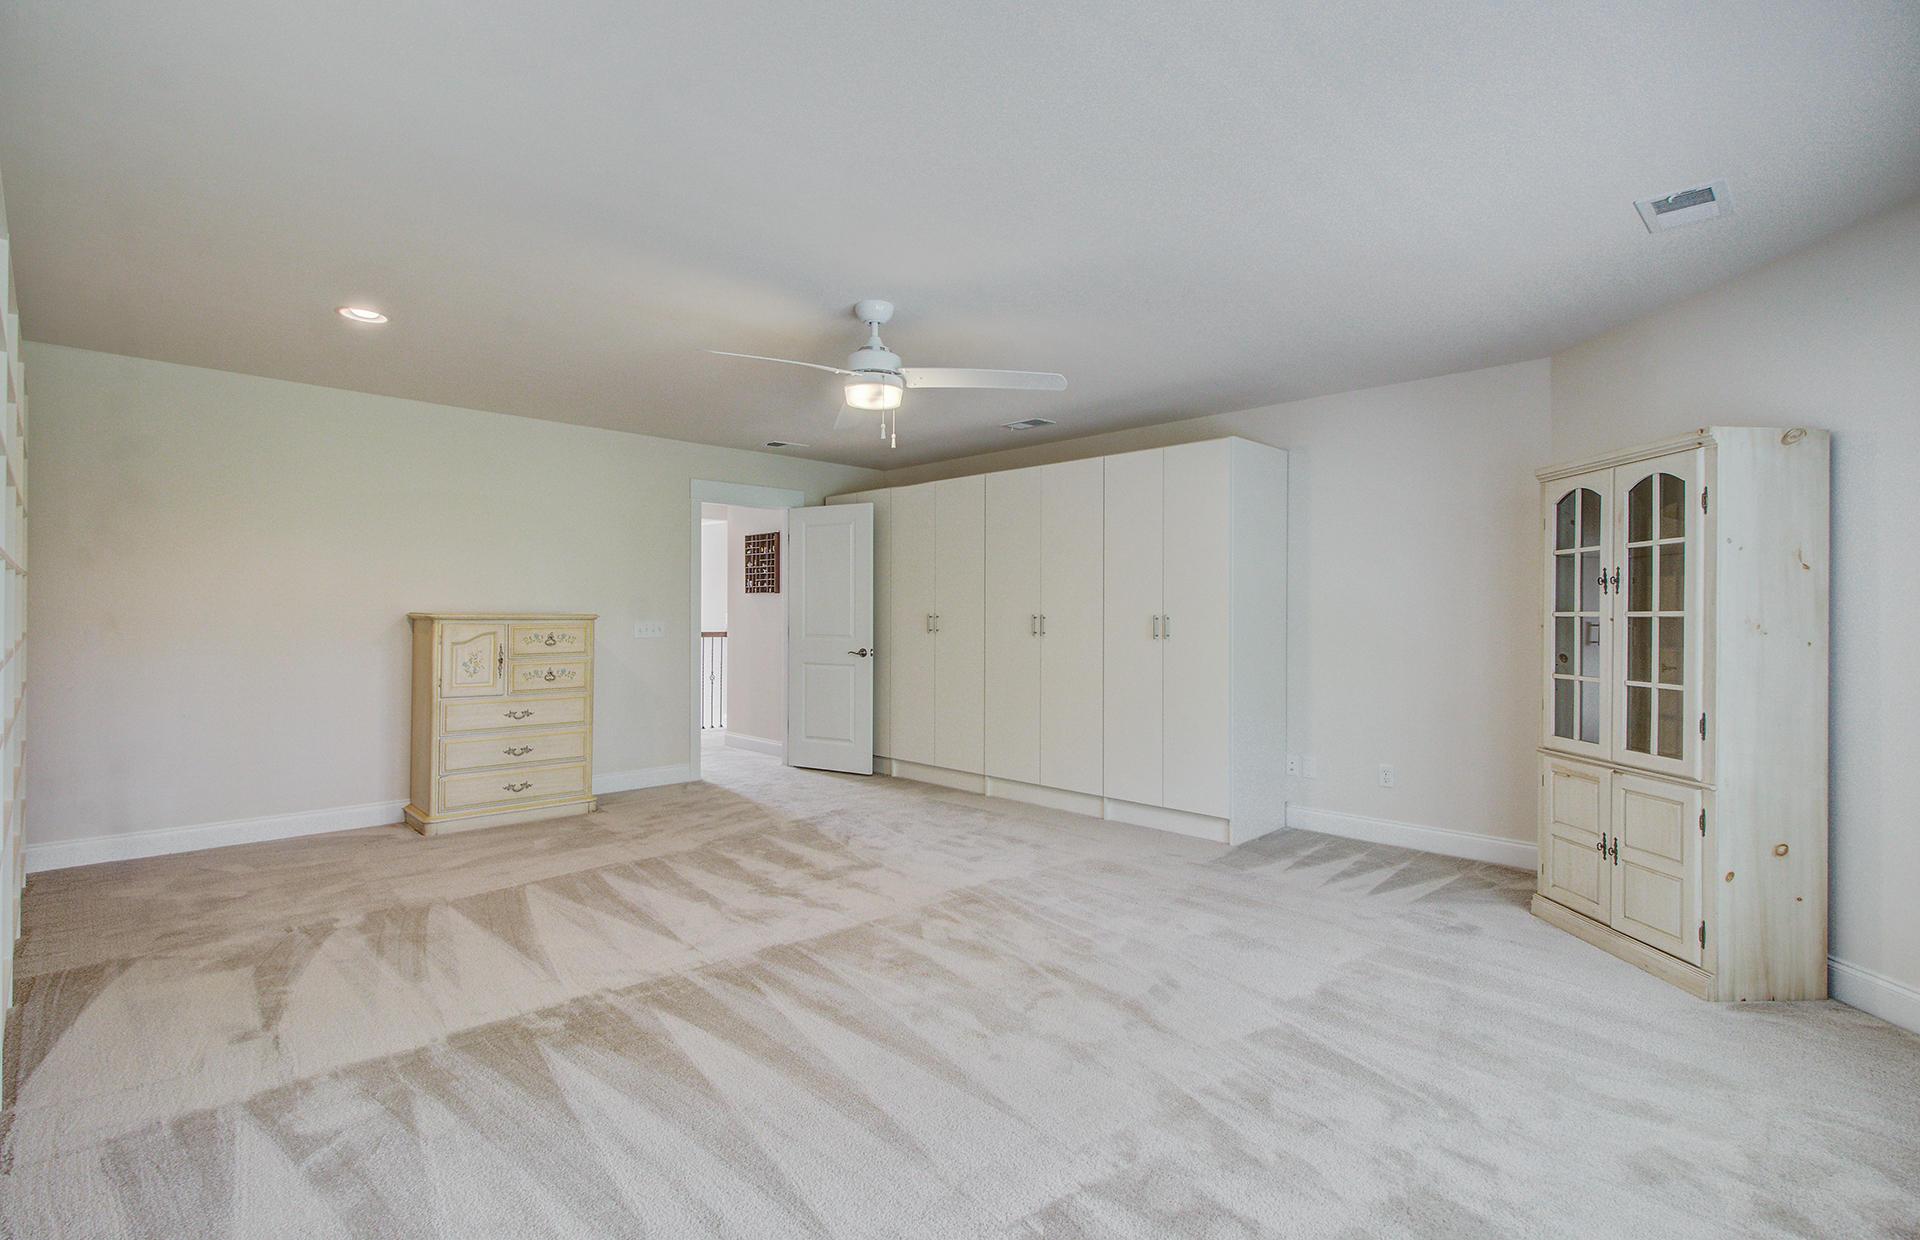 Scotts Creek Homes For Sale - 1404 Scotts Creek, Mount Pleasant, SC - 6